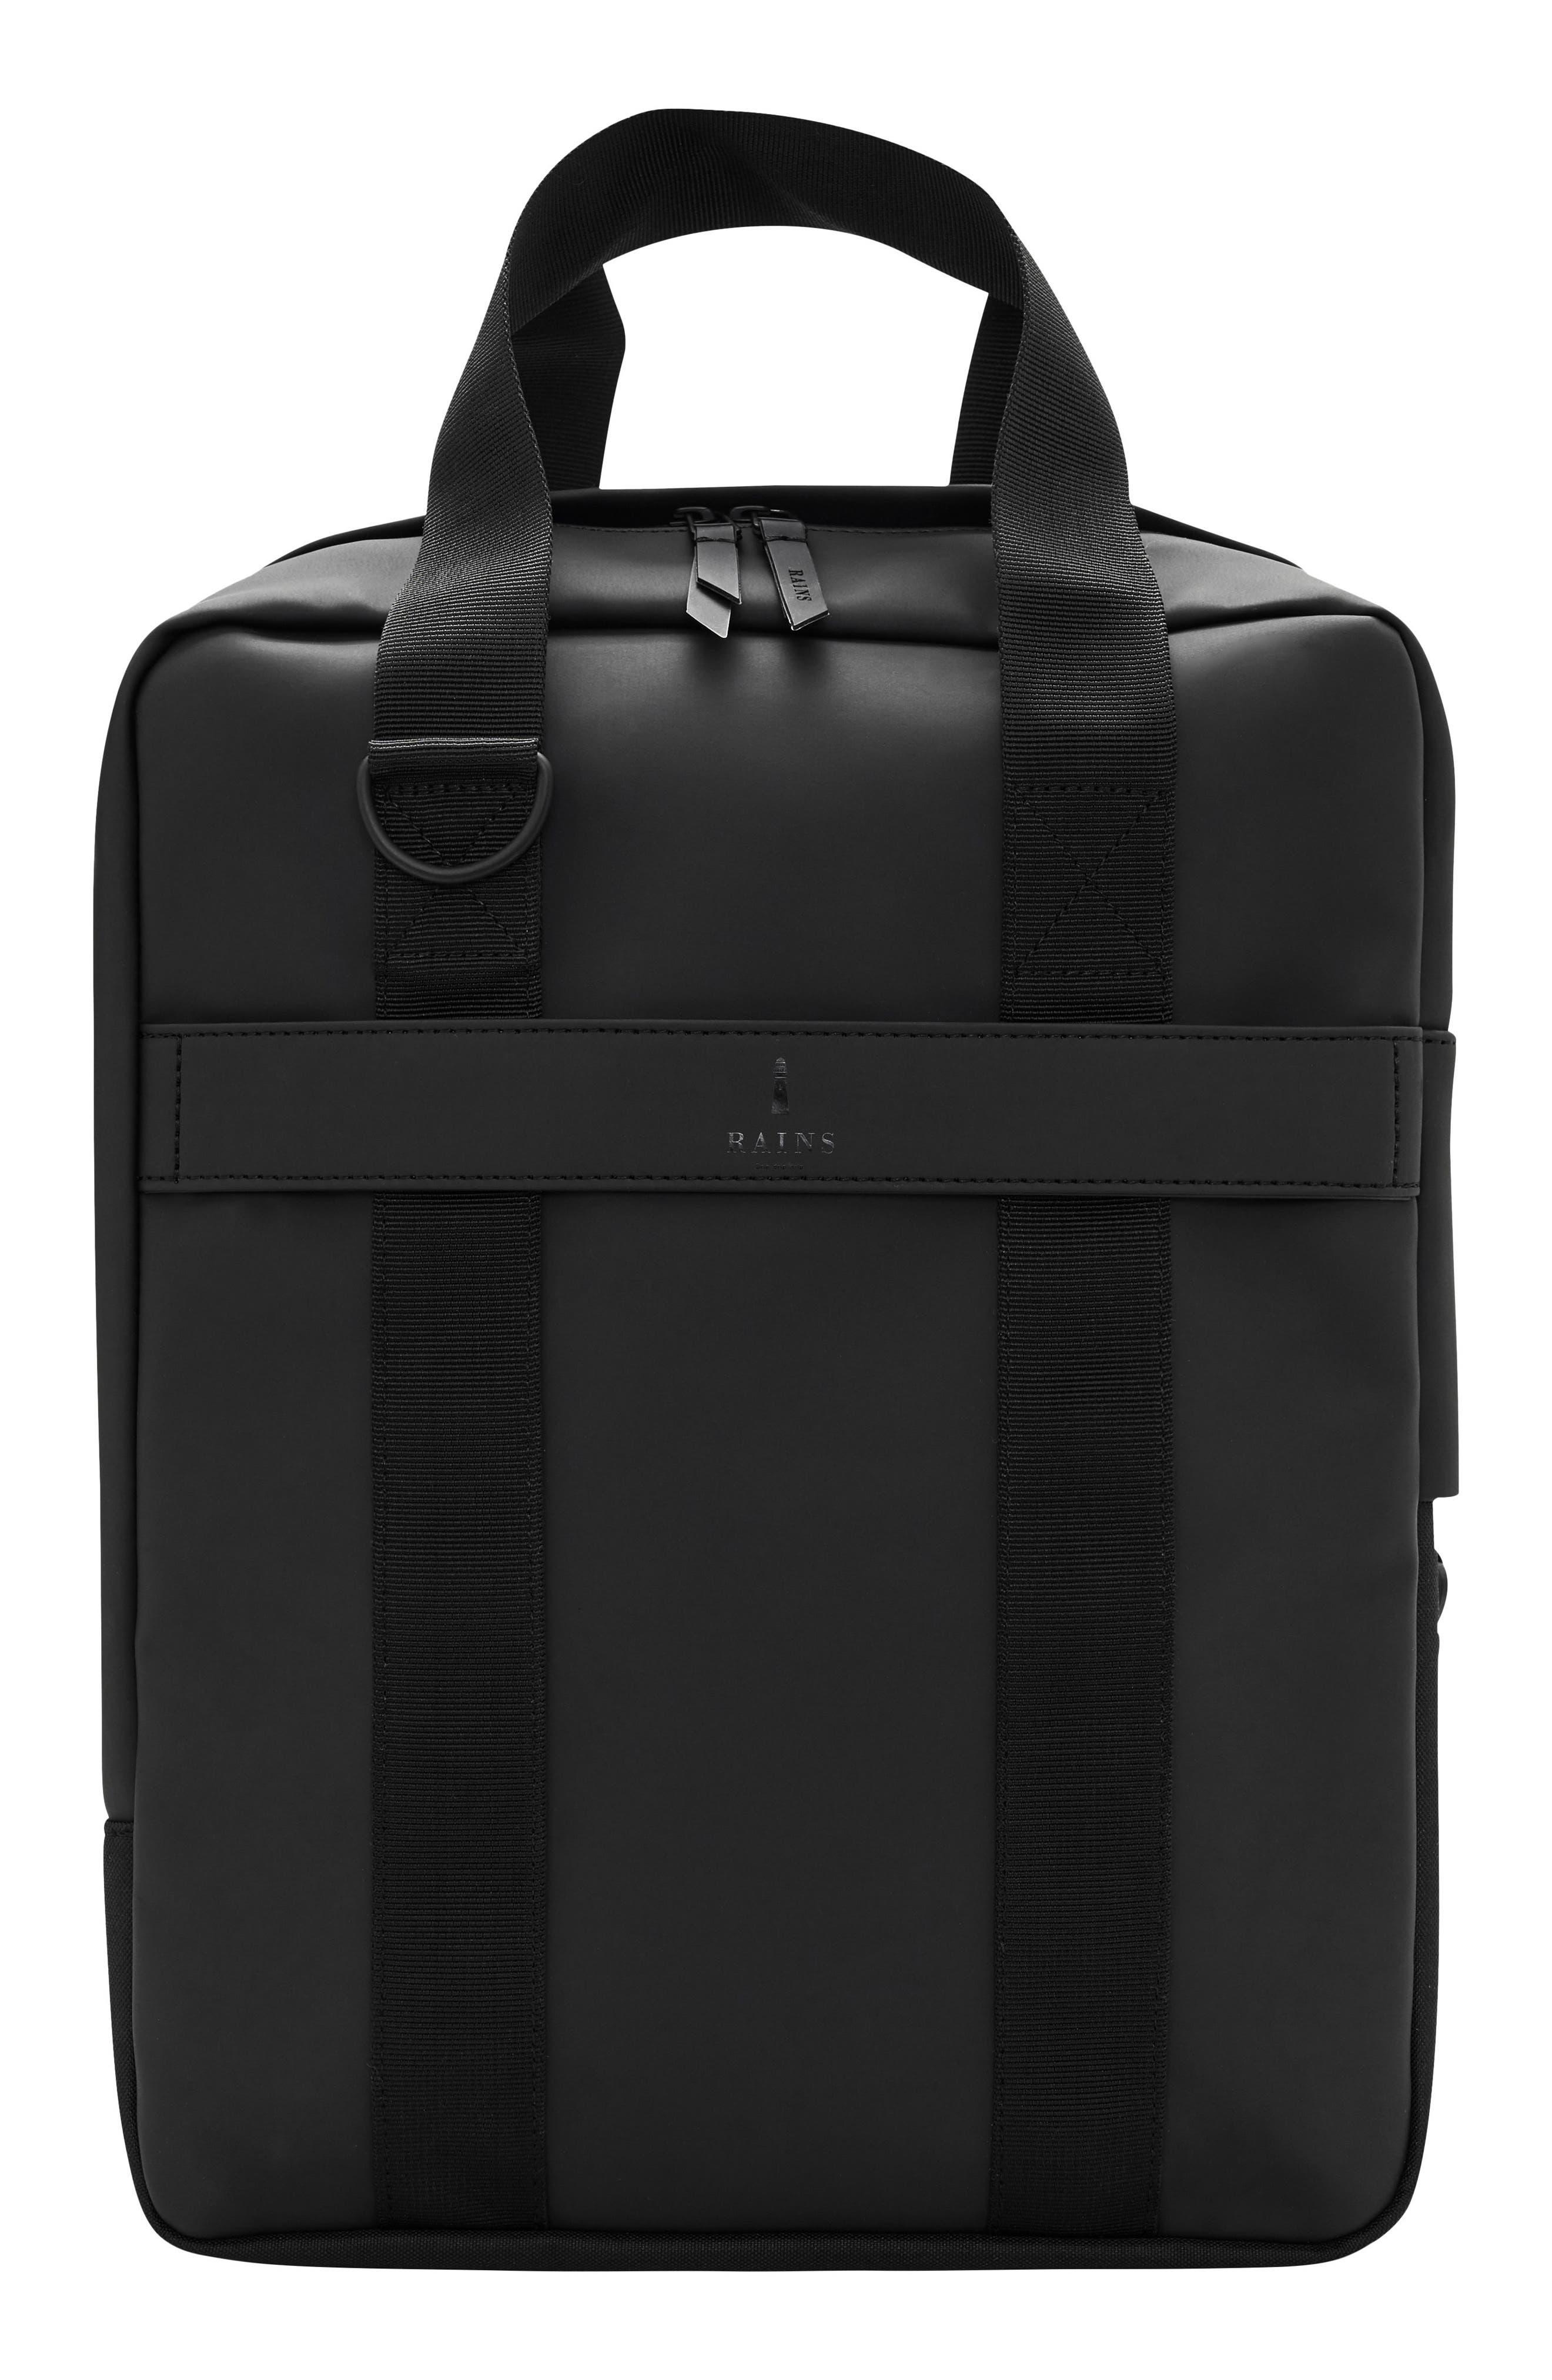 Waterproof Utility Tote Bag,                         Main,                         color, Black